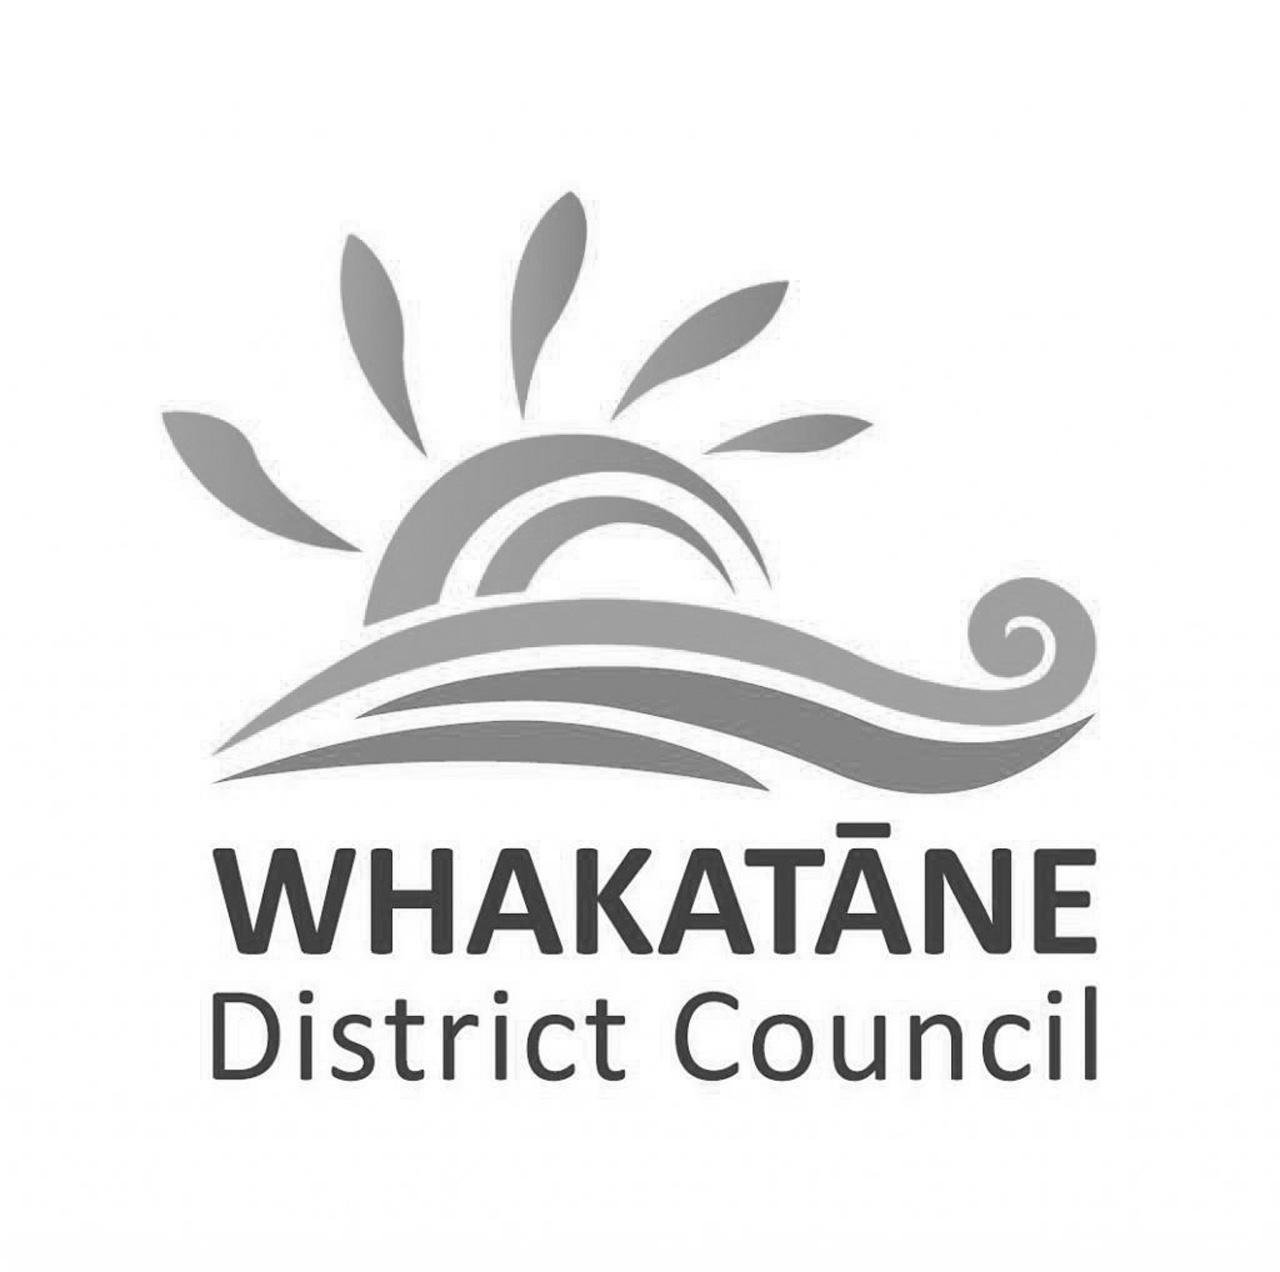 Whakatane_Logo_Black.jpg